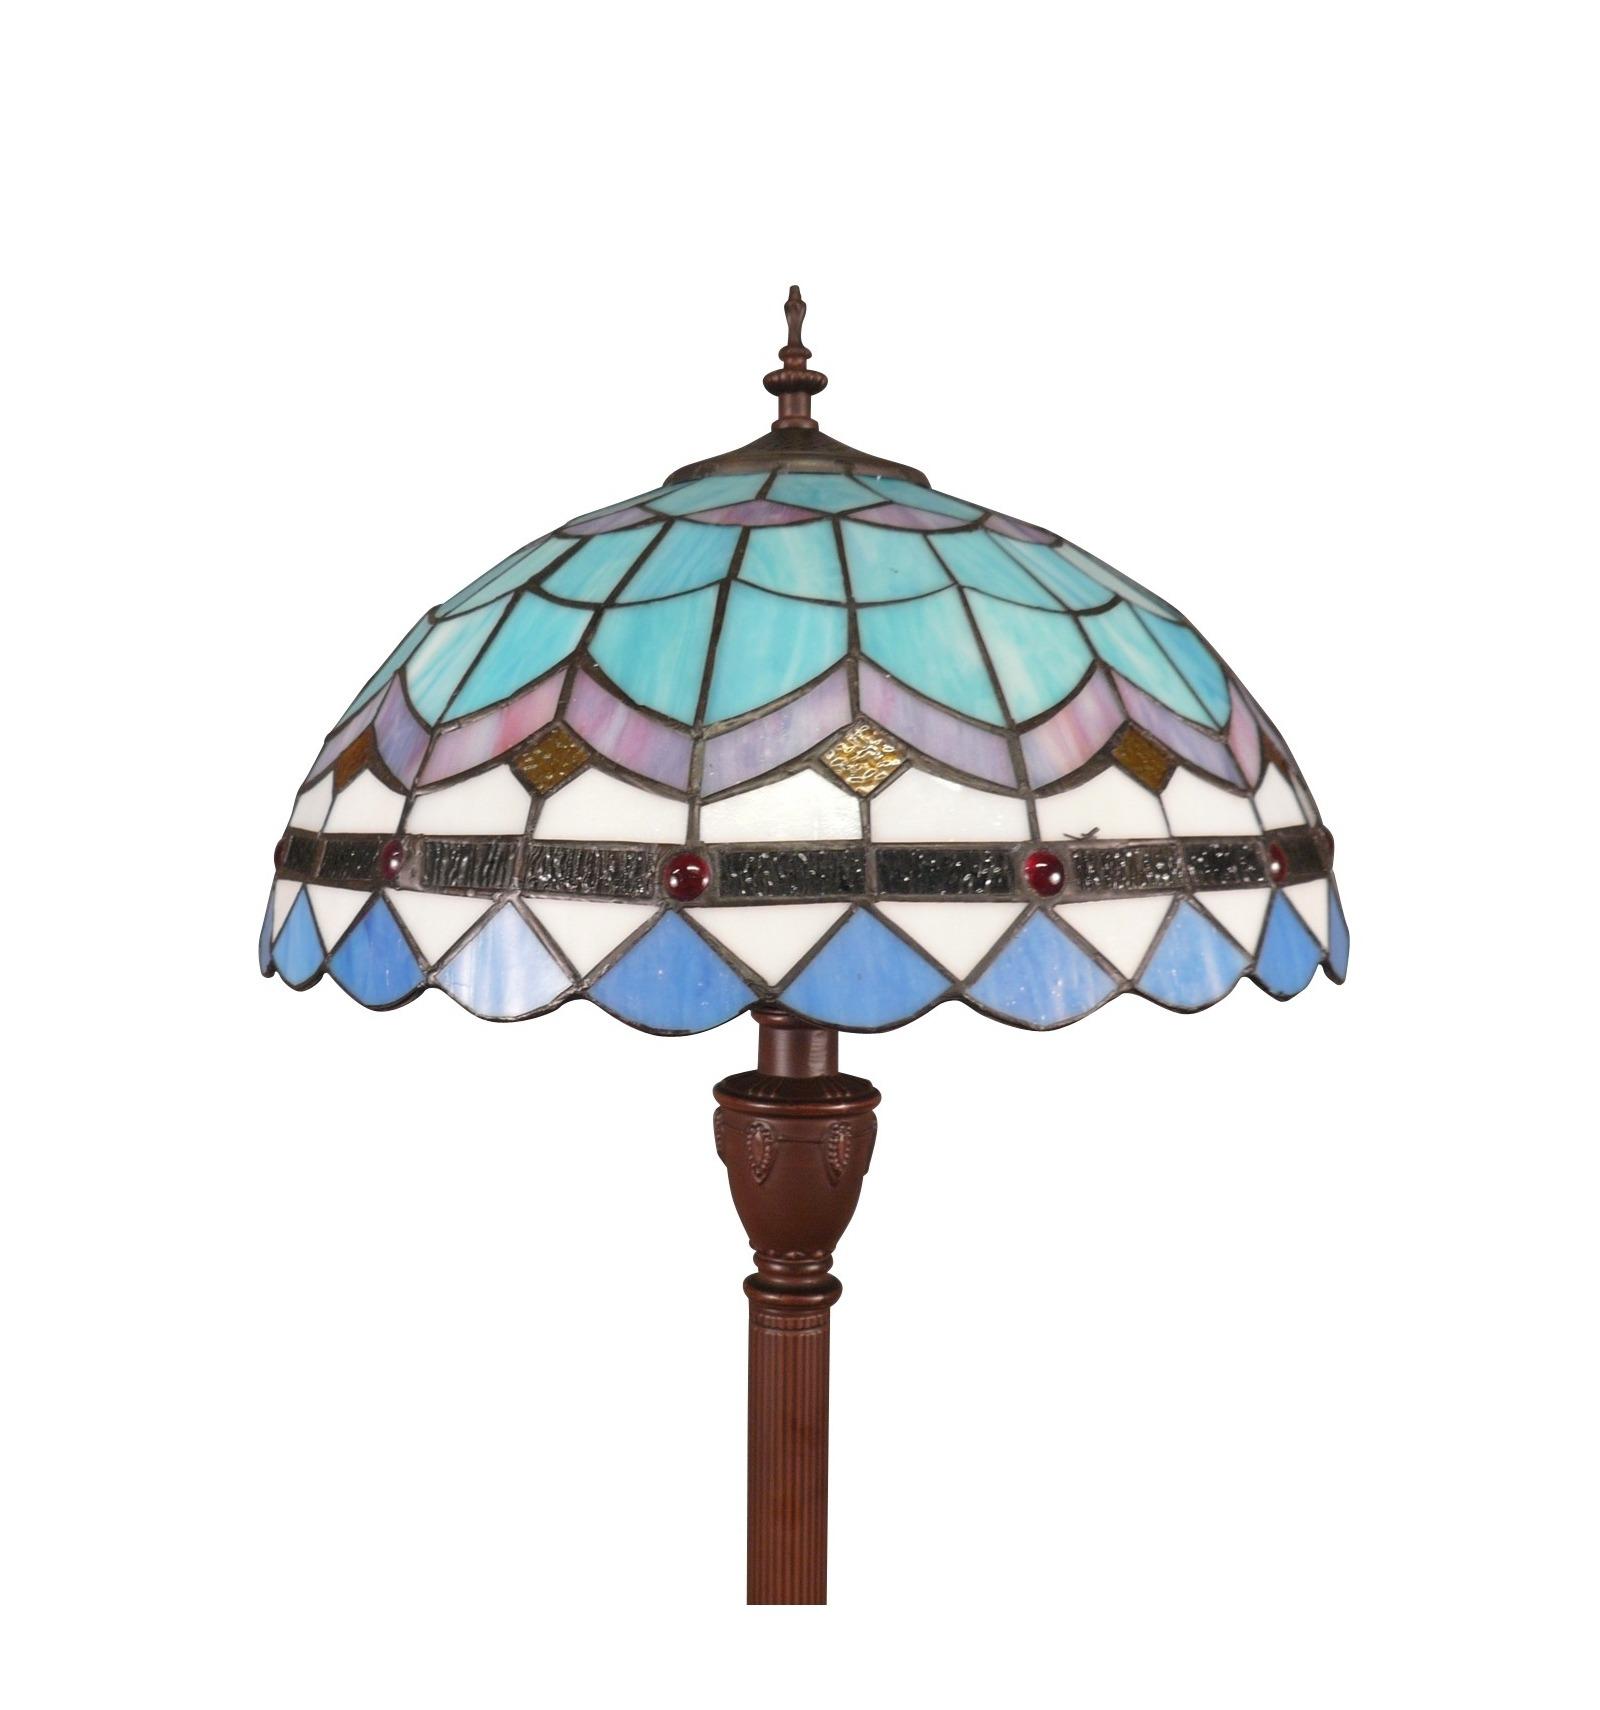 tiffany floor lamp blue of the monaco series. Black Bedroom Furniture Sets. Home Design Ideas